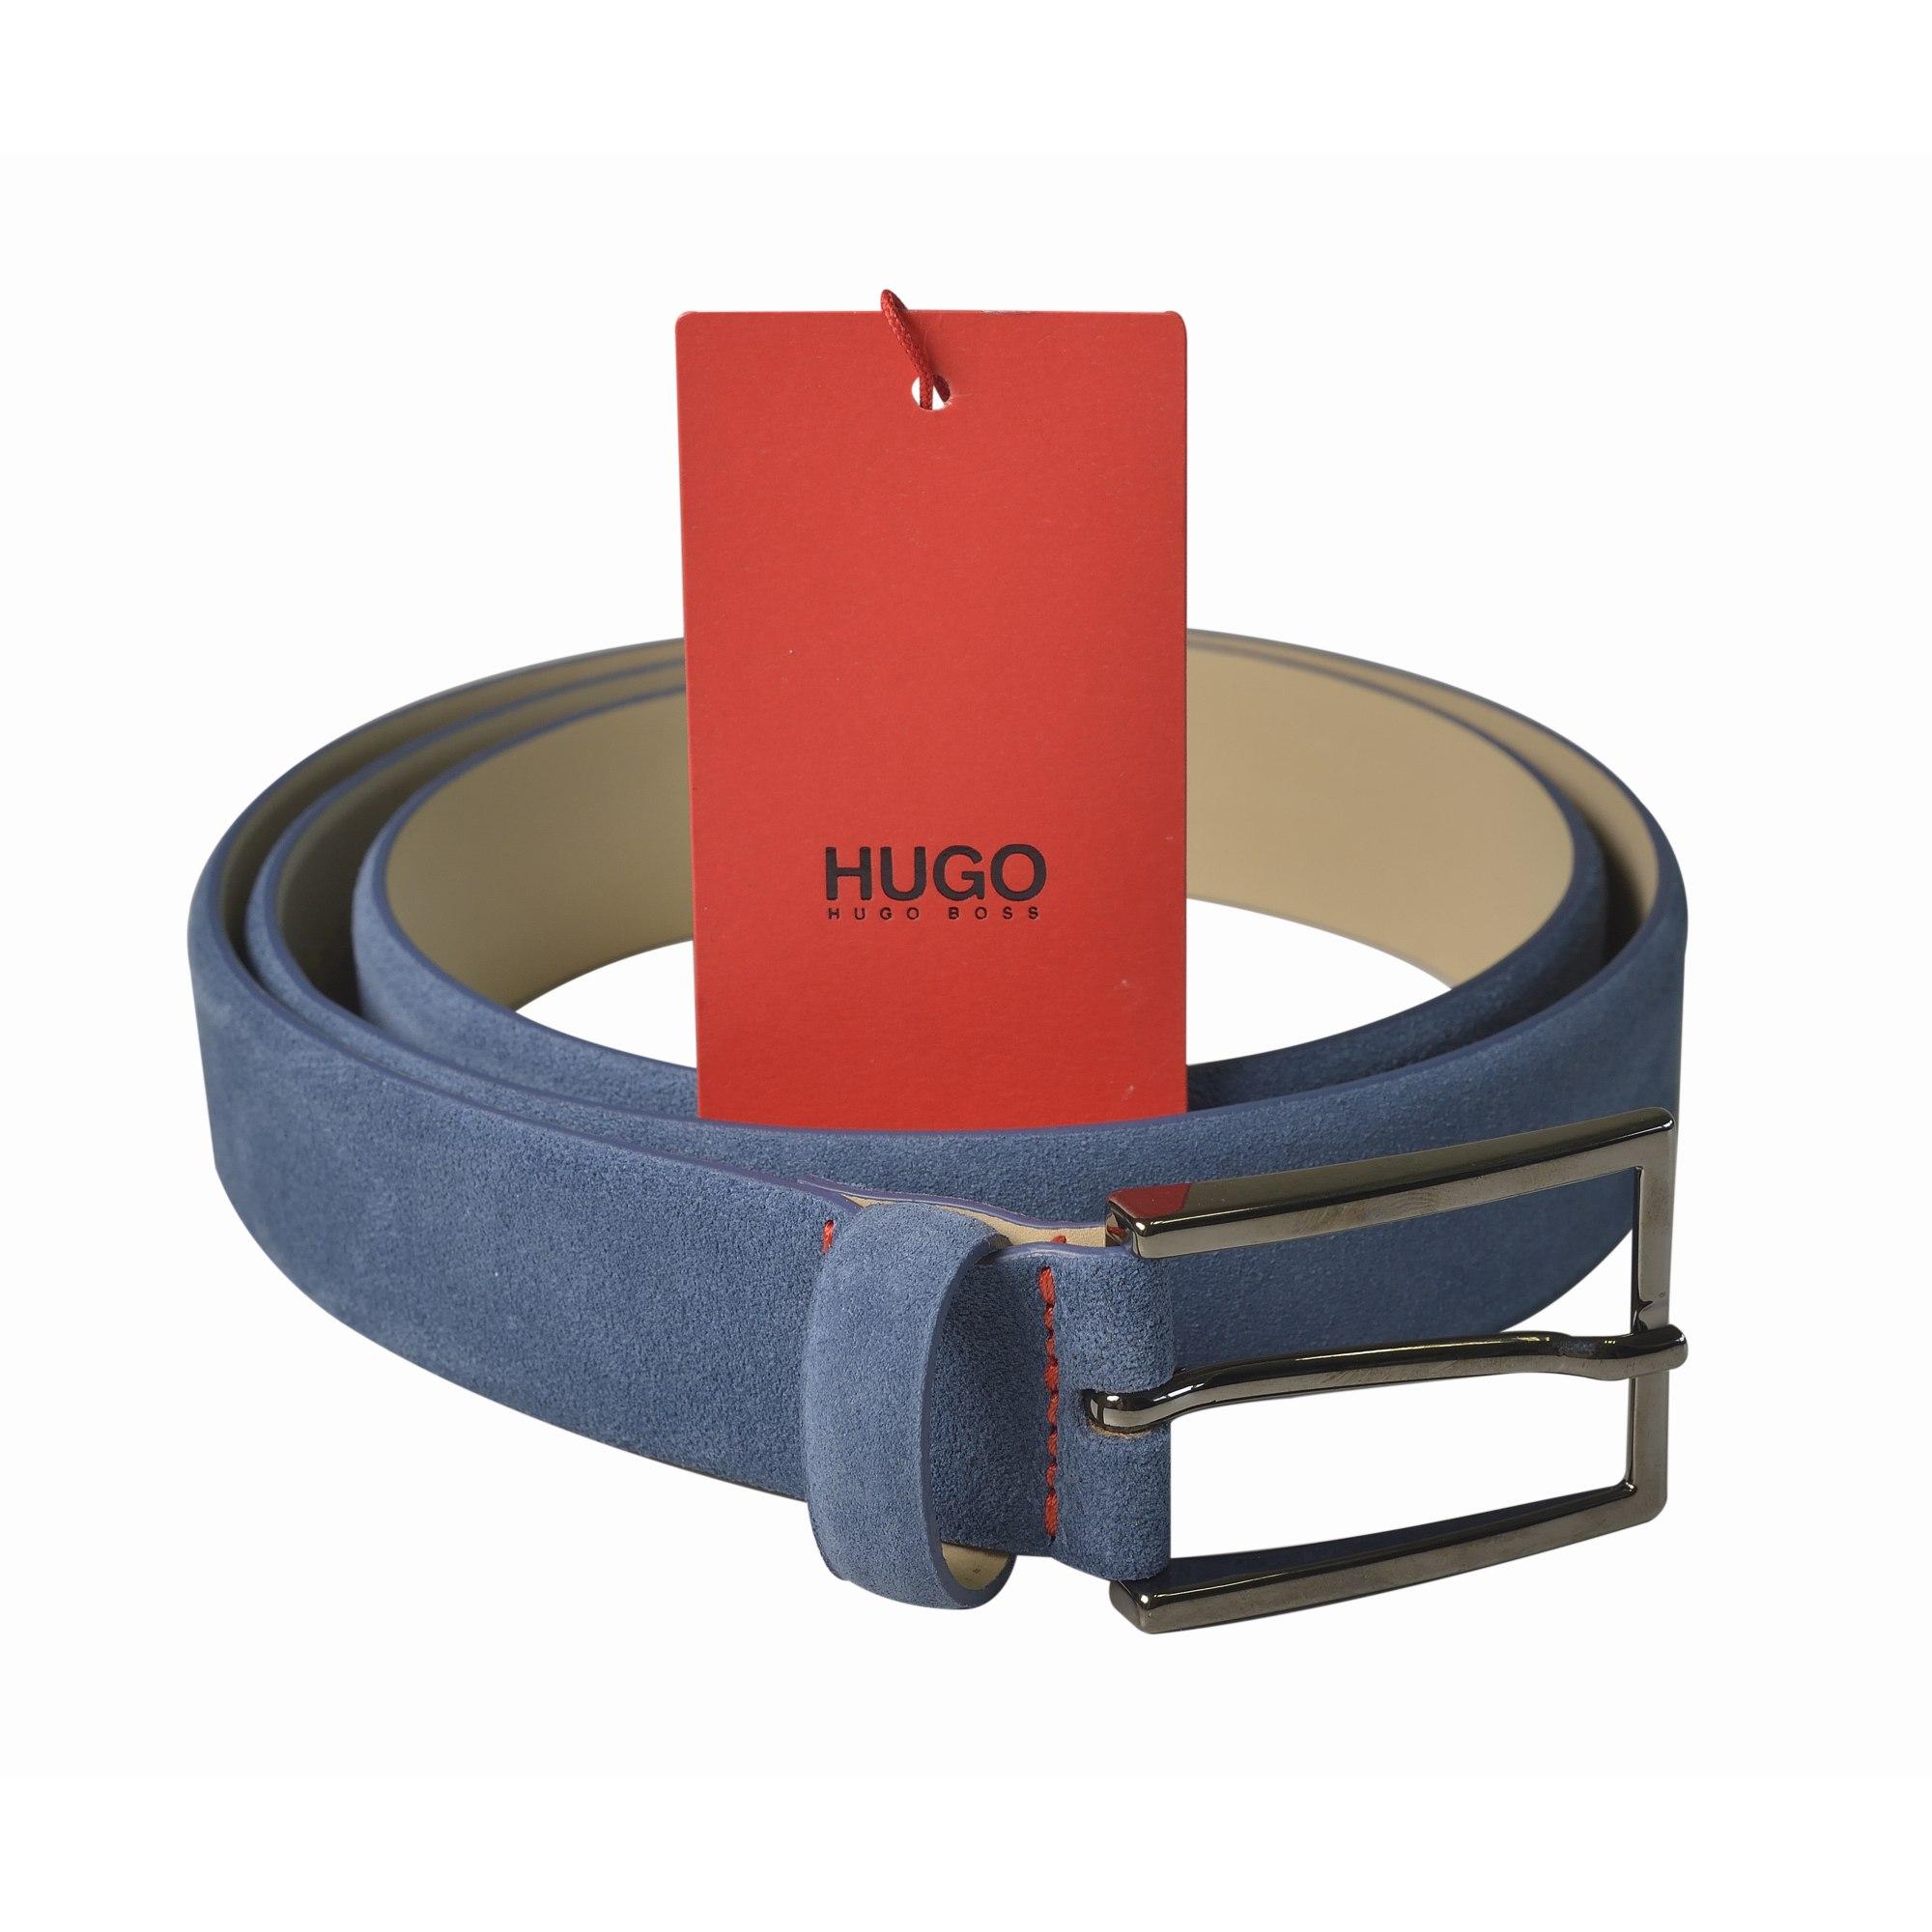 4ca77287c5c Ceinture HUGO BOSS 90 bleu vendu par Dress-code 75 - 6478140